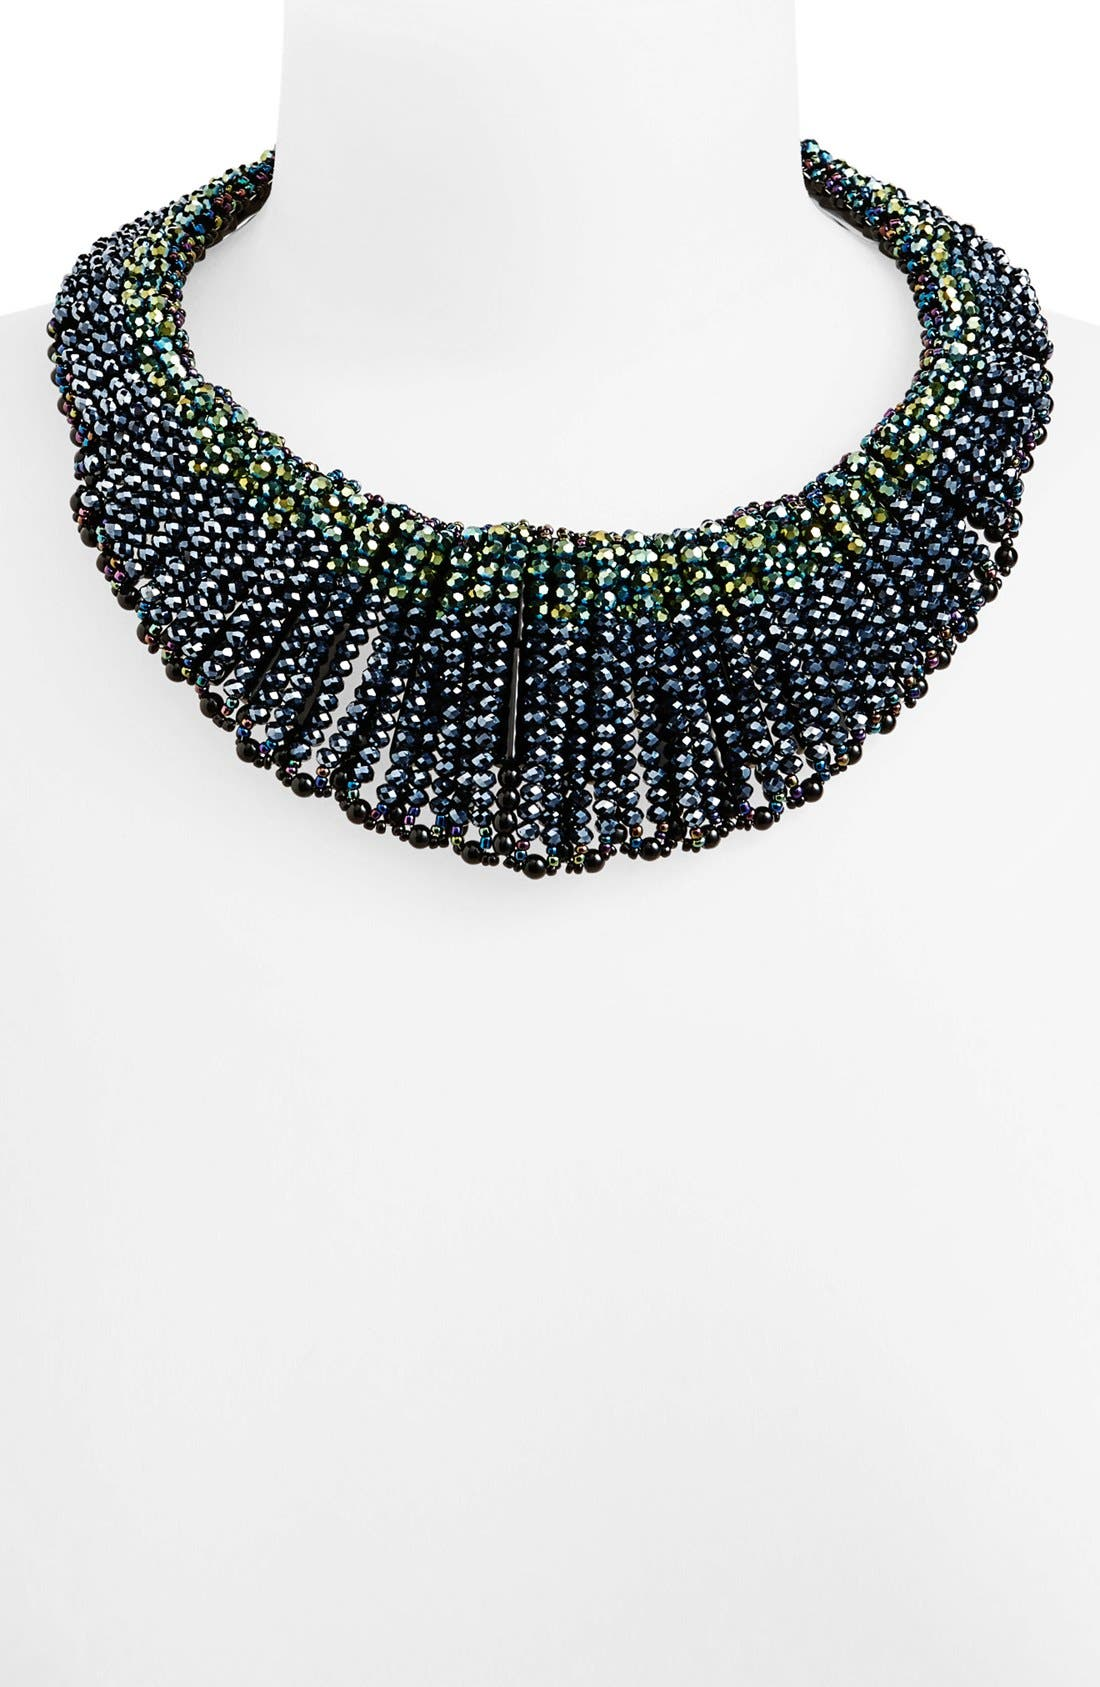 Main Image - Nakamol Design Multistrand Collar Necklace